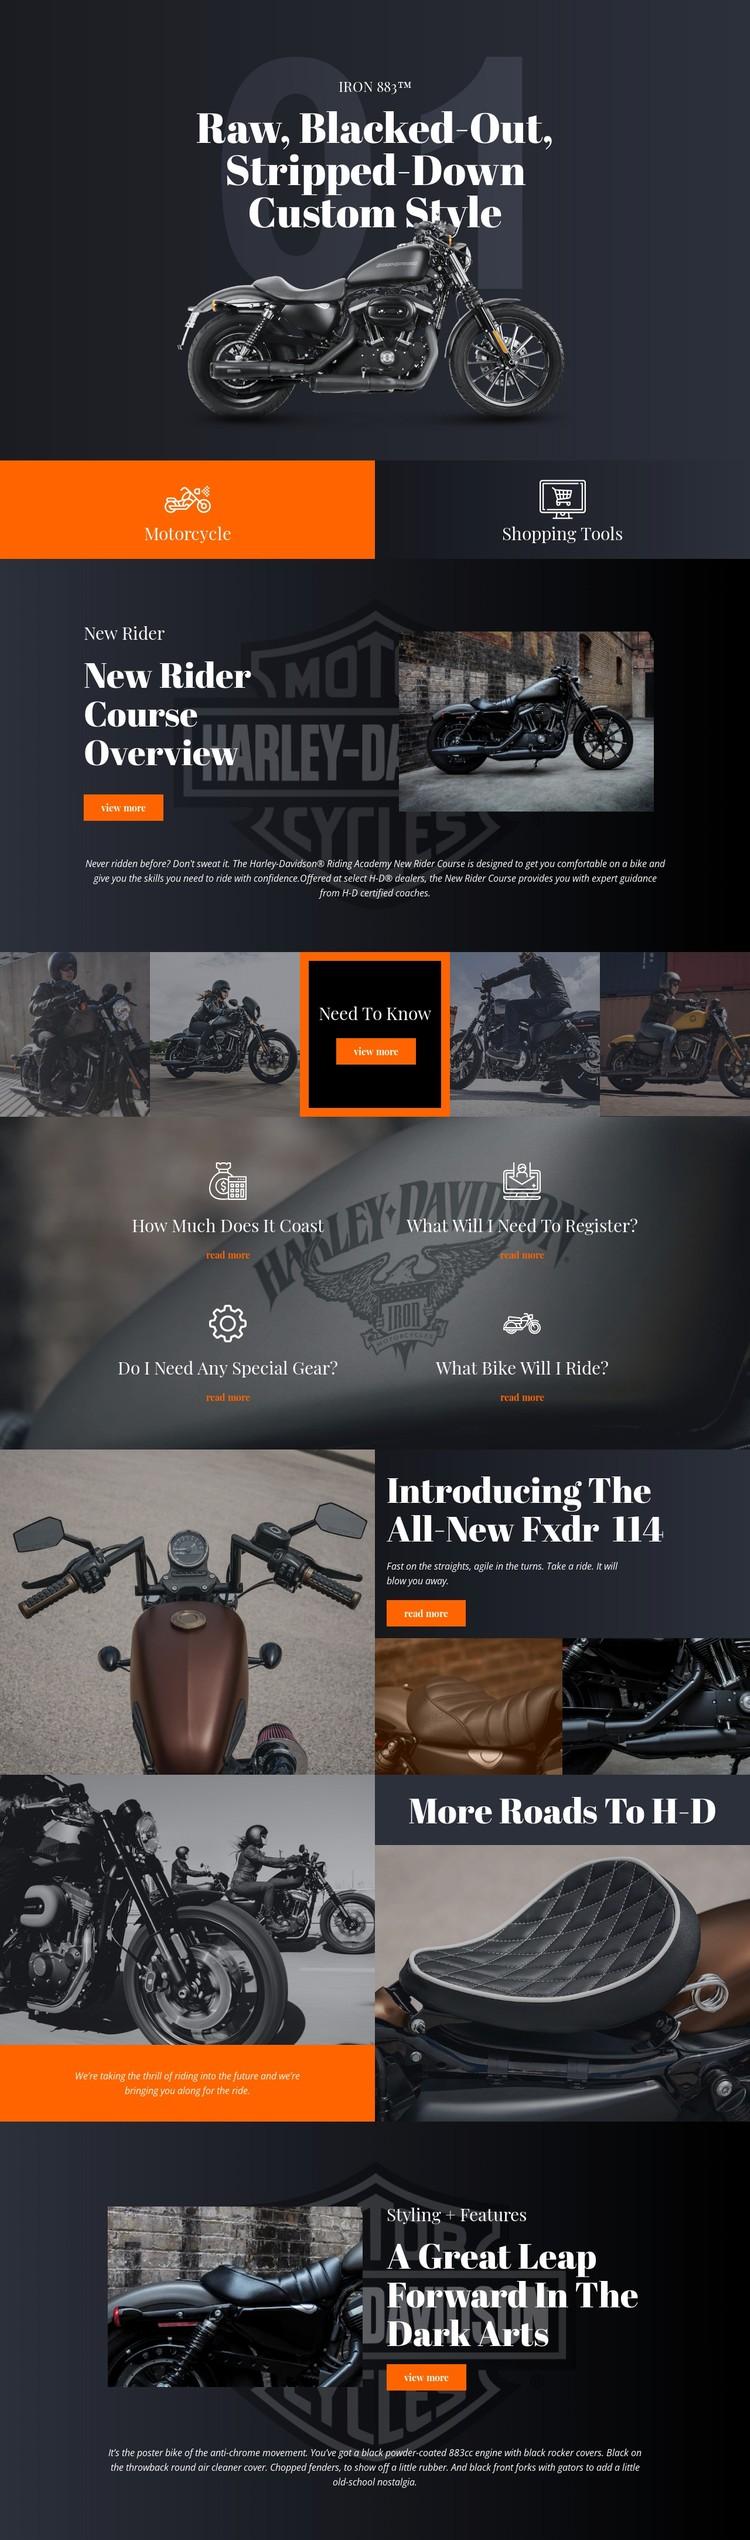 Harley Davidson Static Site Generator